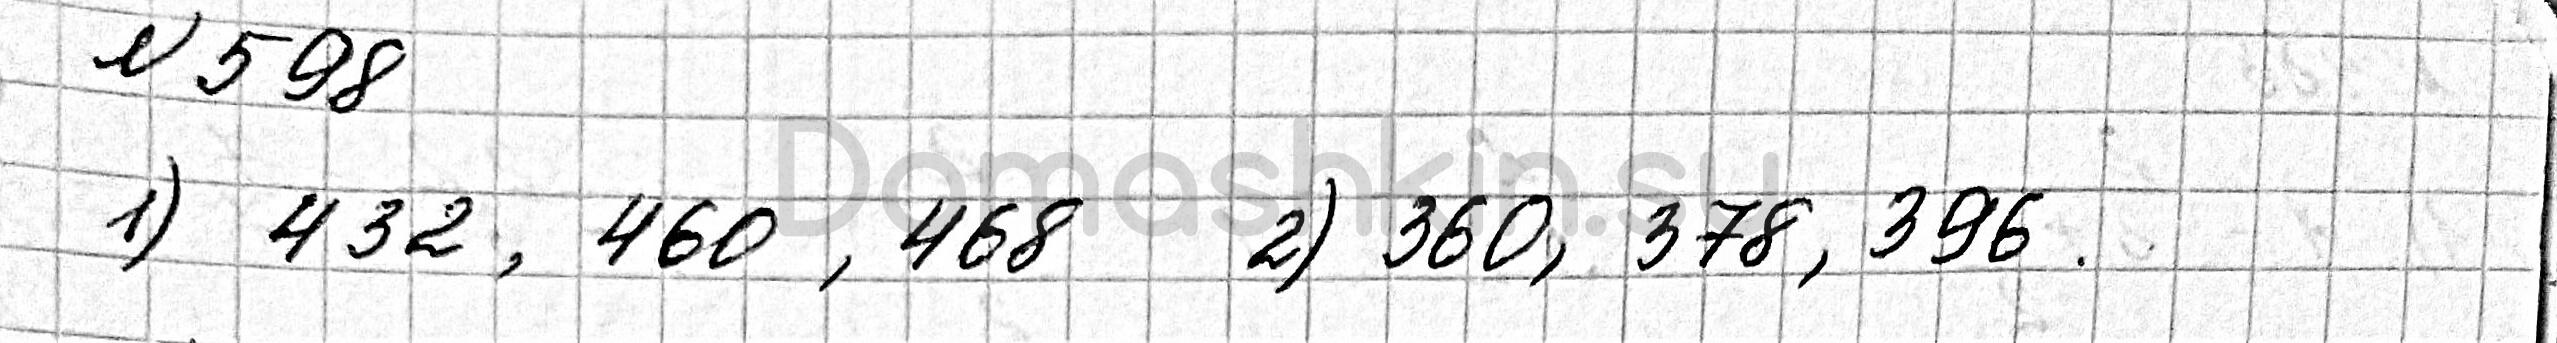 Математика 6 класс учебник Мерзляк номер 598 решение